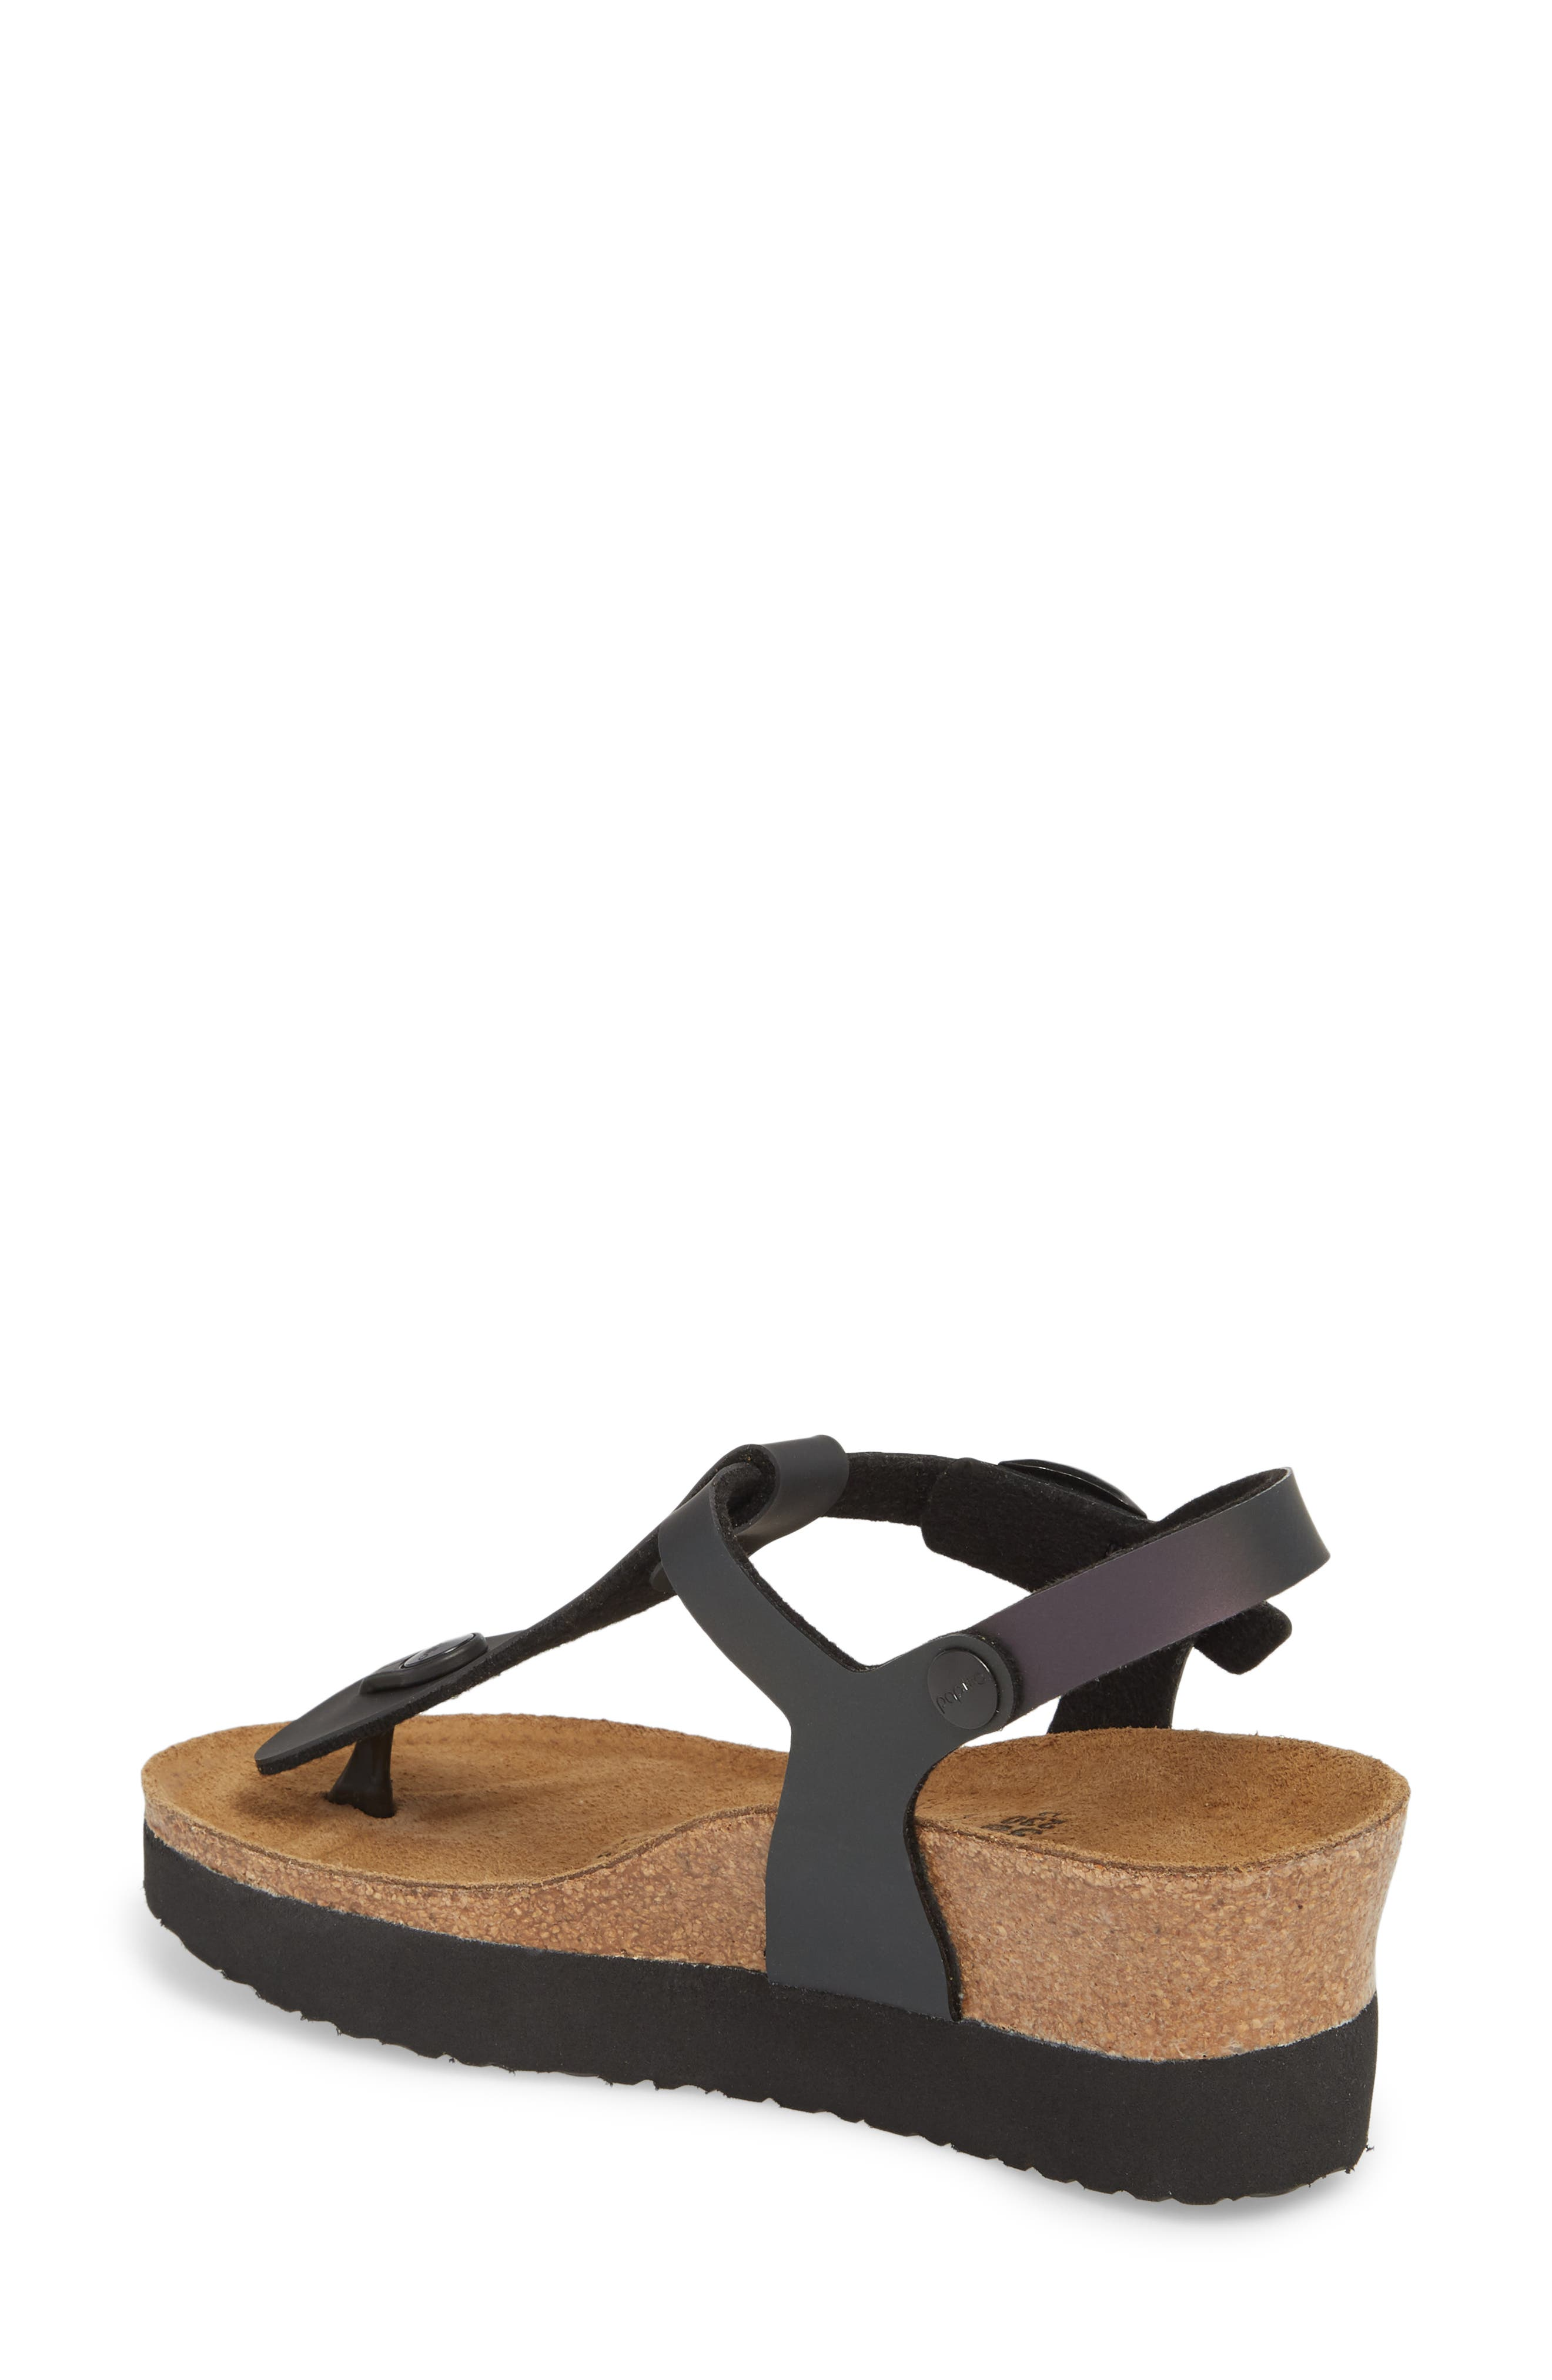 Ashley Sandal,                             Alternate thumbnail 2, color,                             Iridescent Black Leather